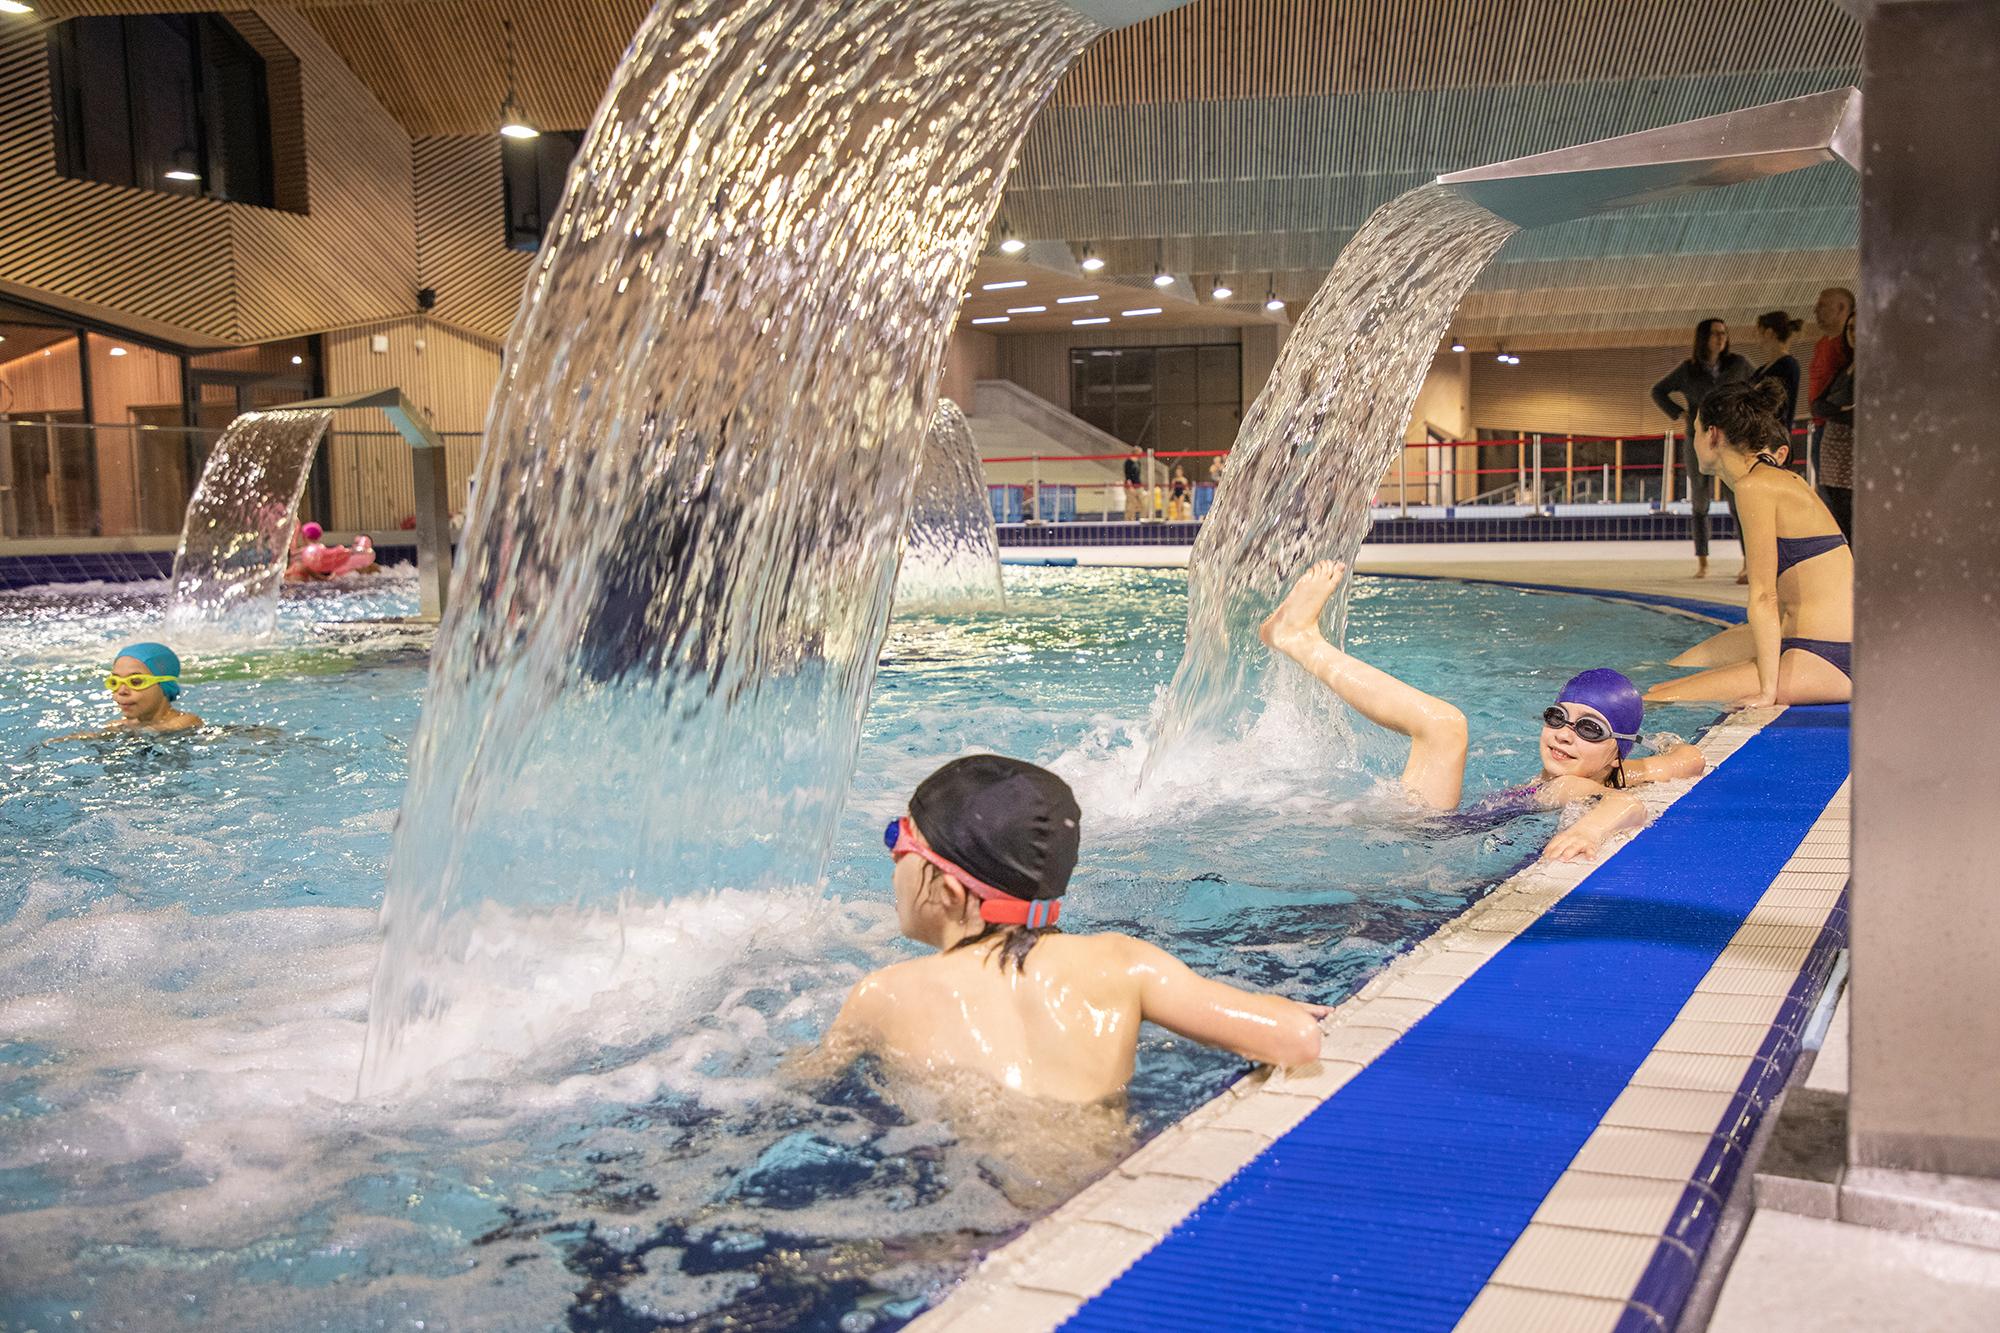 Piscine Aqualudique Du Stade De Chambéry - Grand Chambéry serapportantà Piscine Des Halles